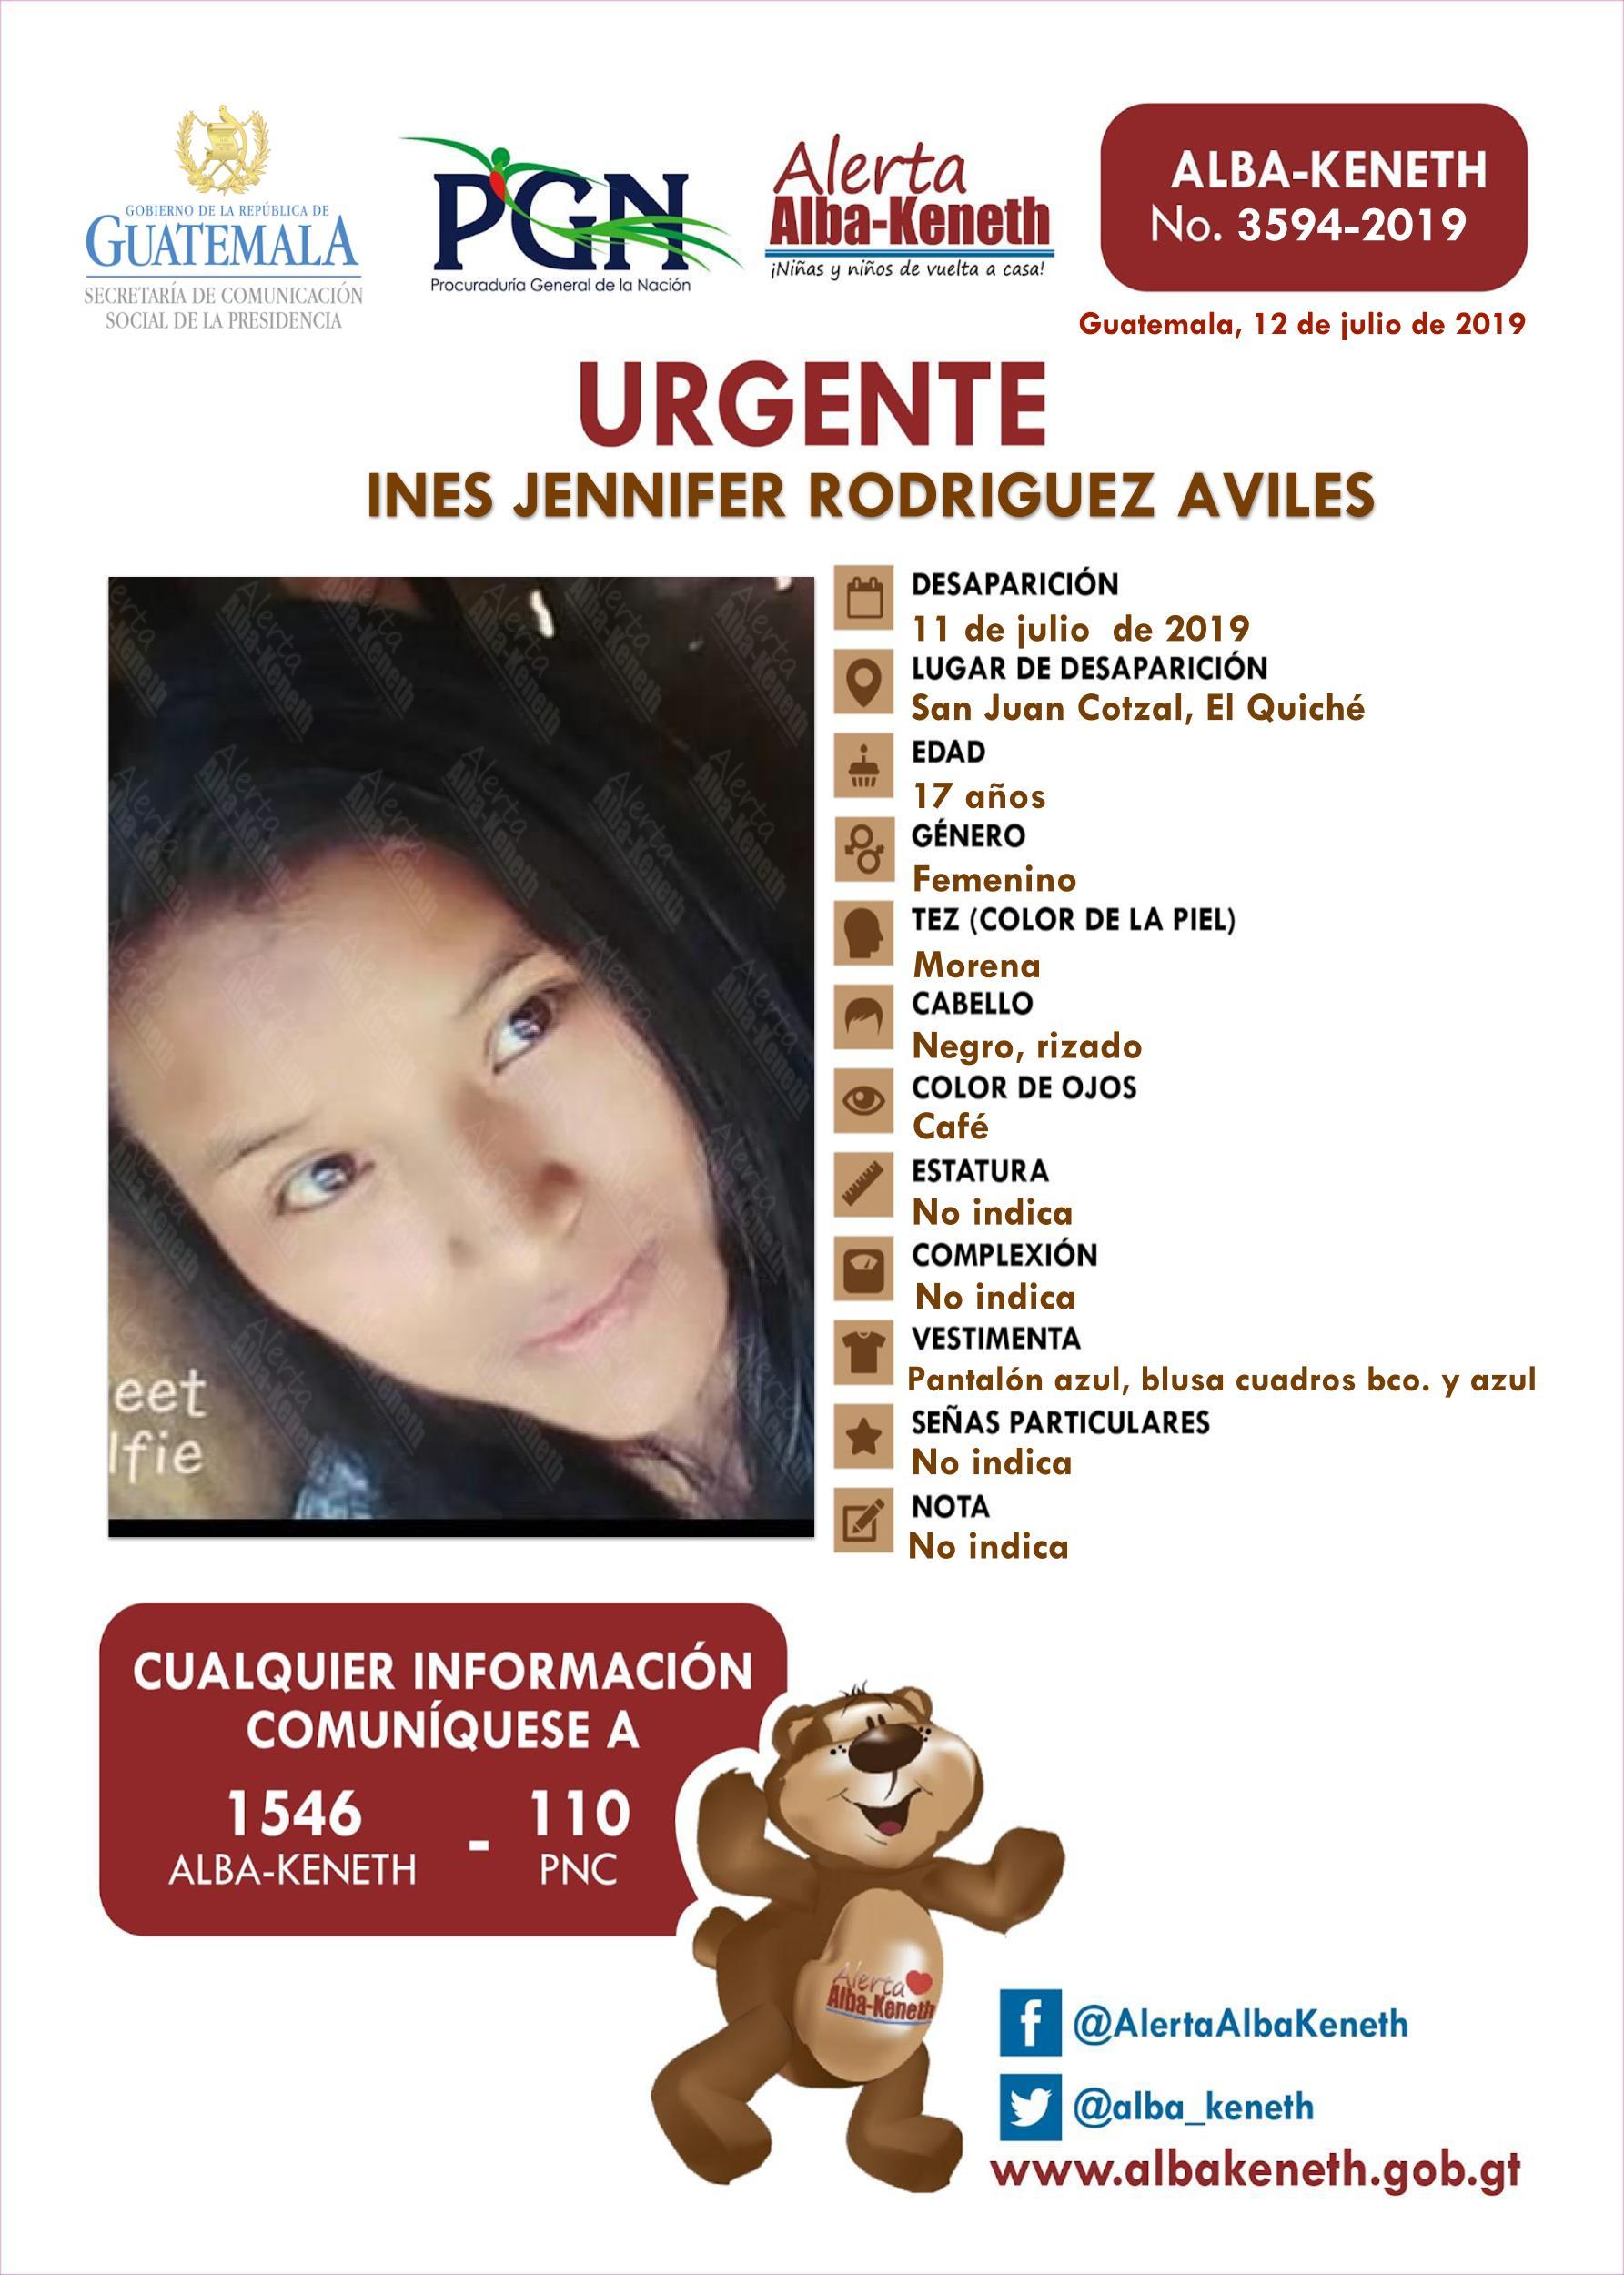 Ines Jennifer Rodriguez Aviles